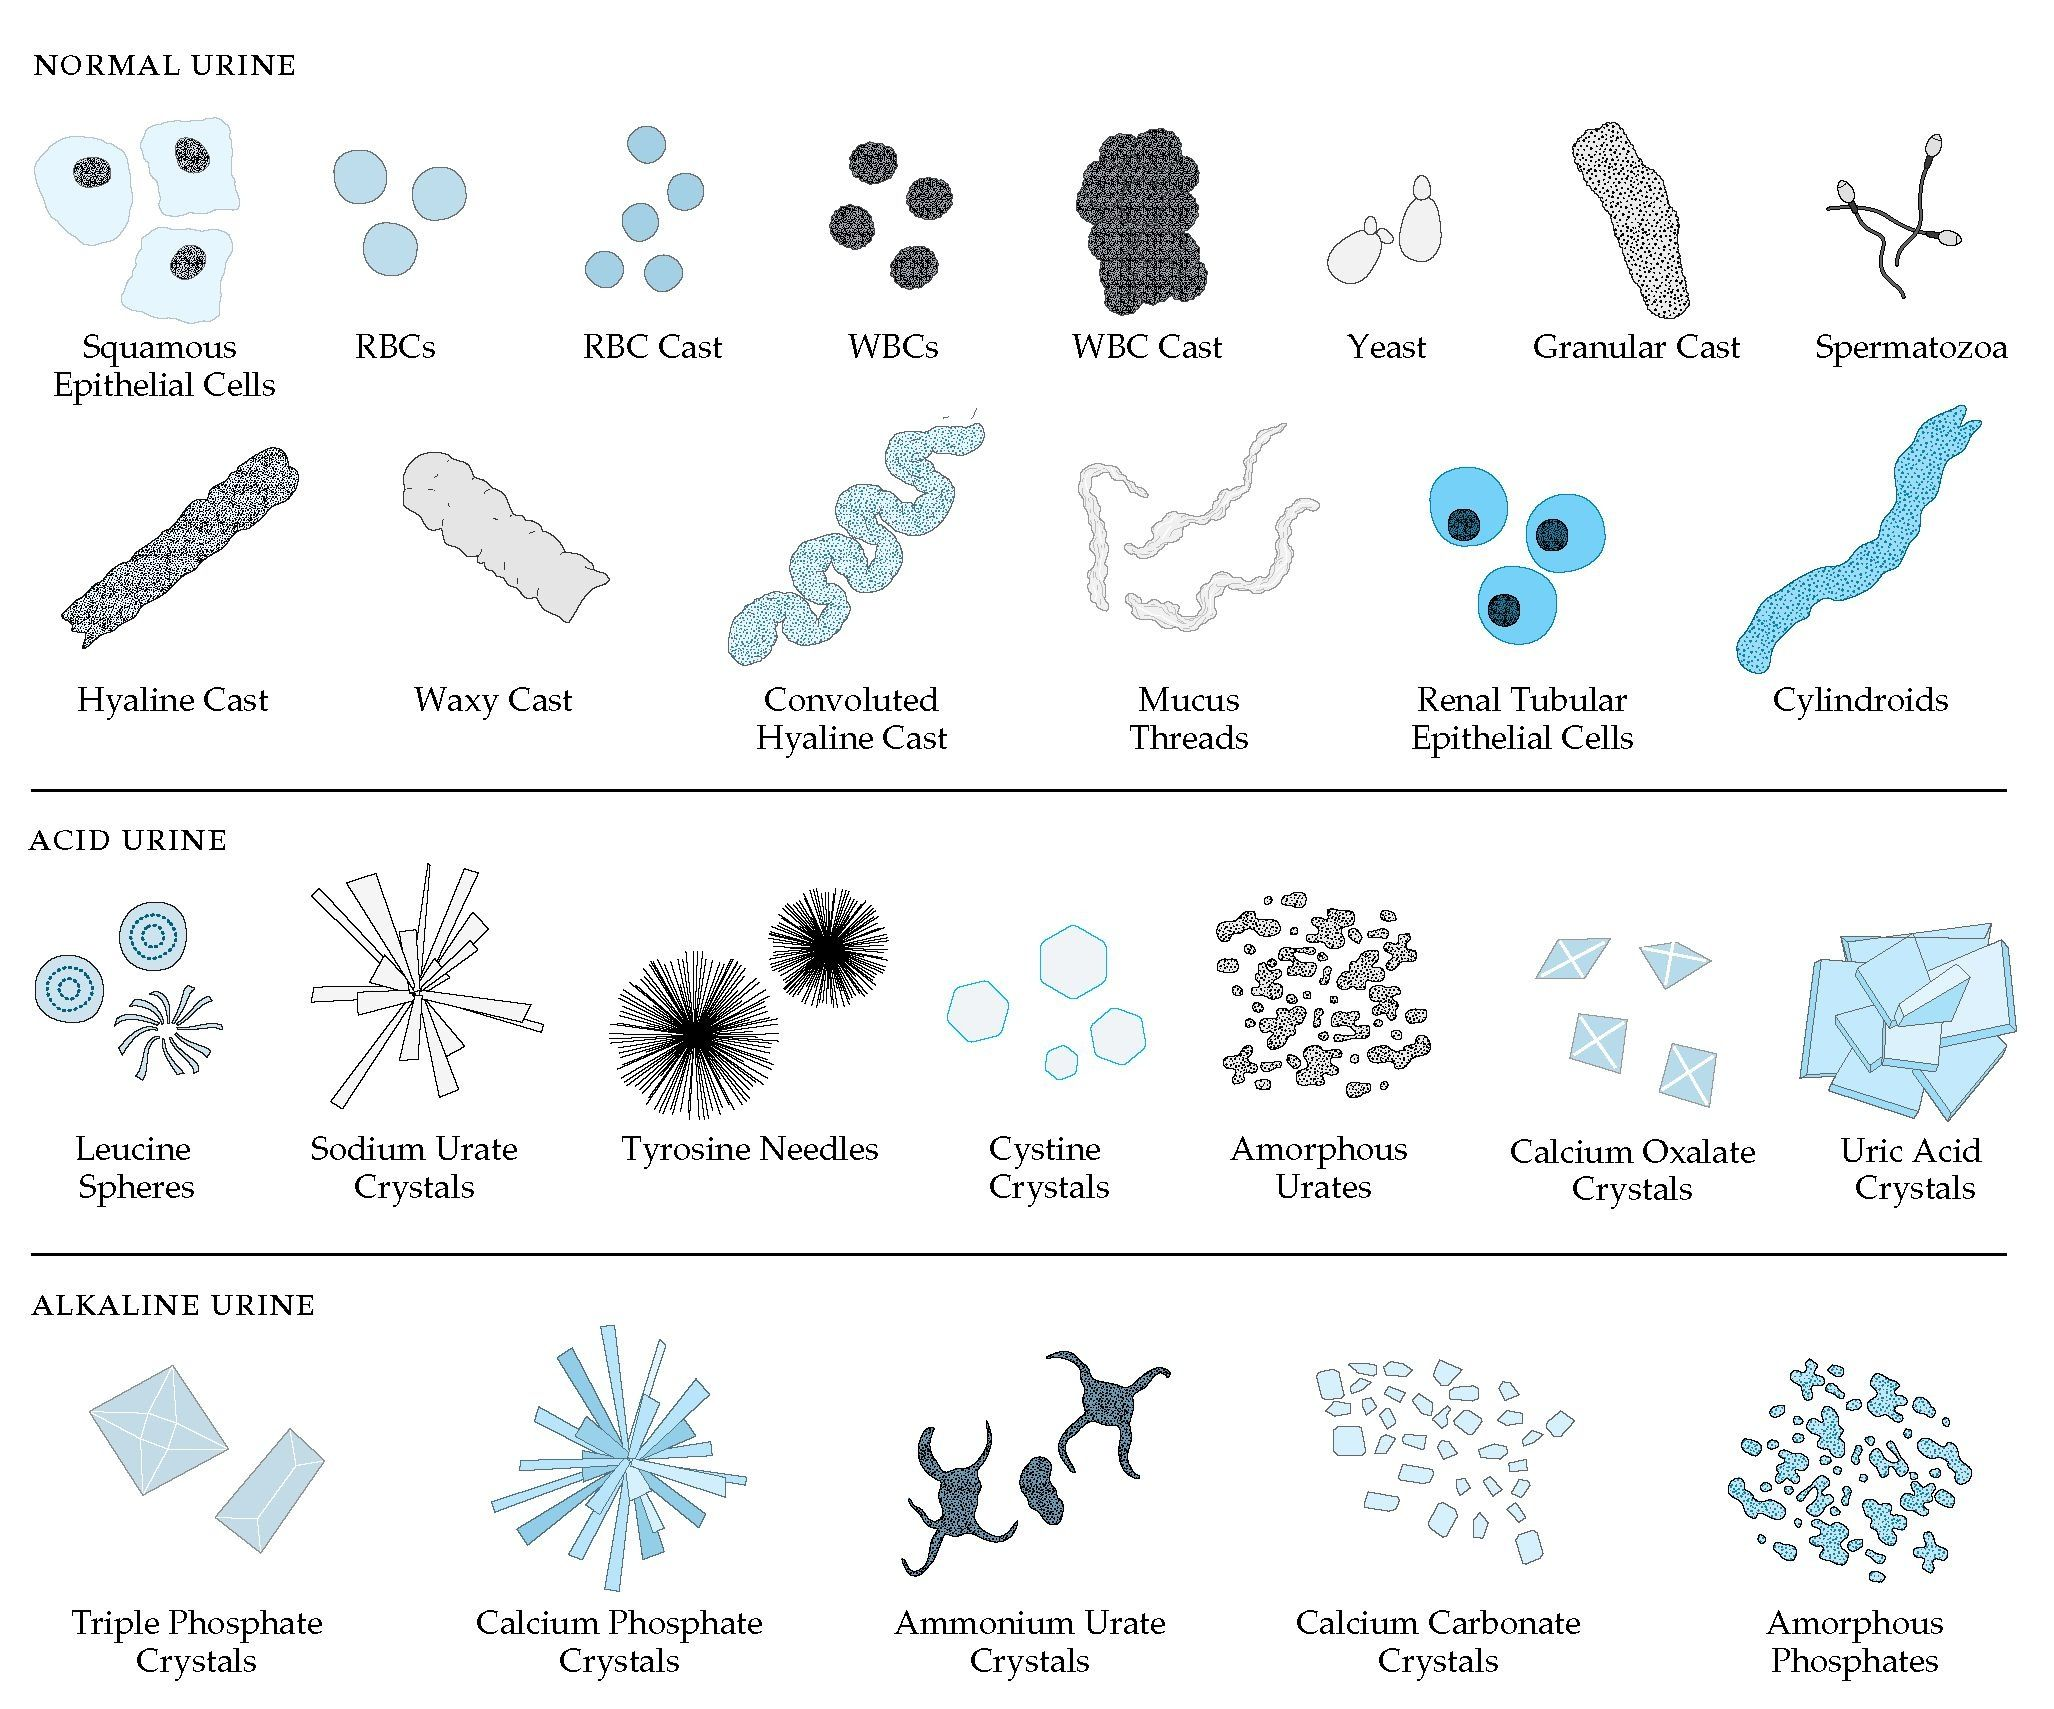 cells in urine sediment - Google Search | MLT Stuff | Pinterest ...